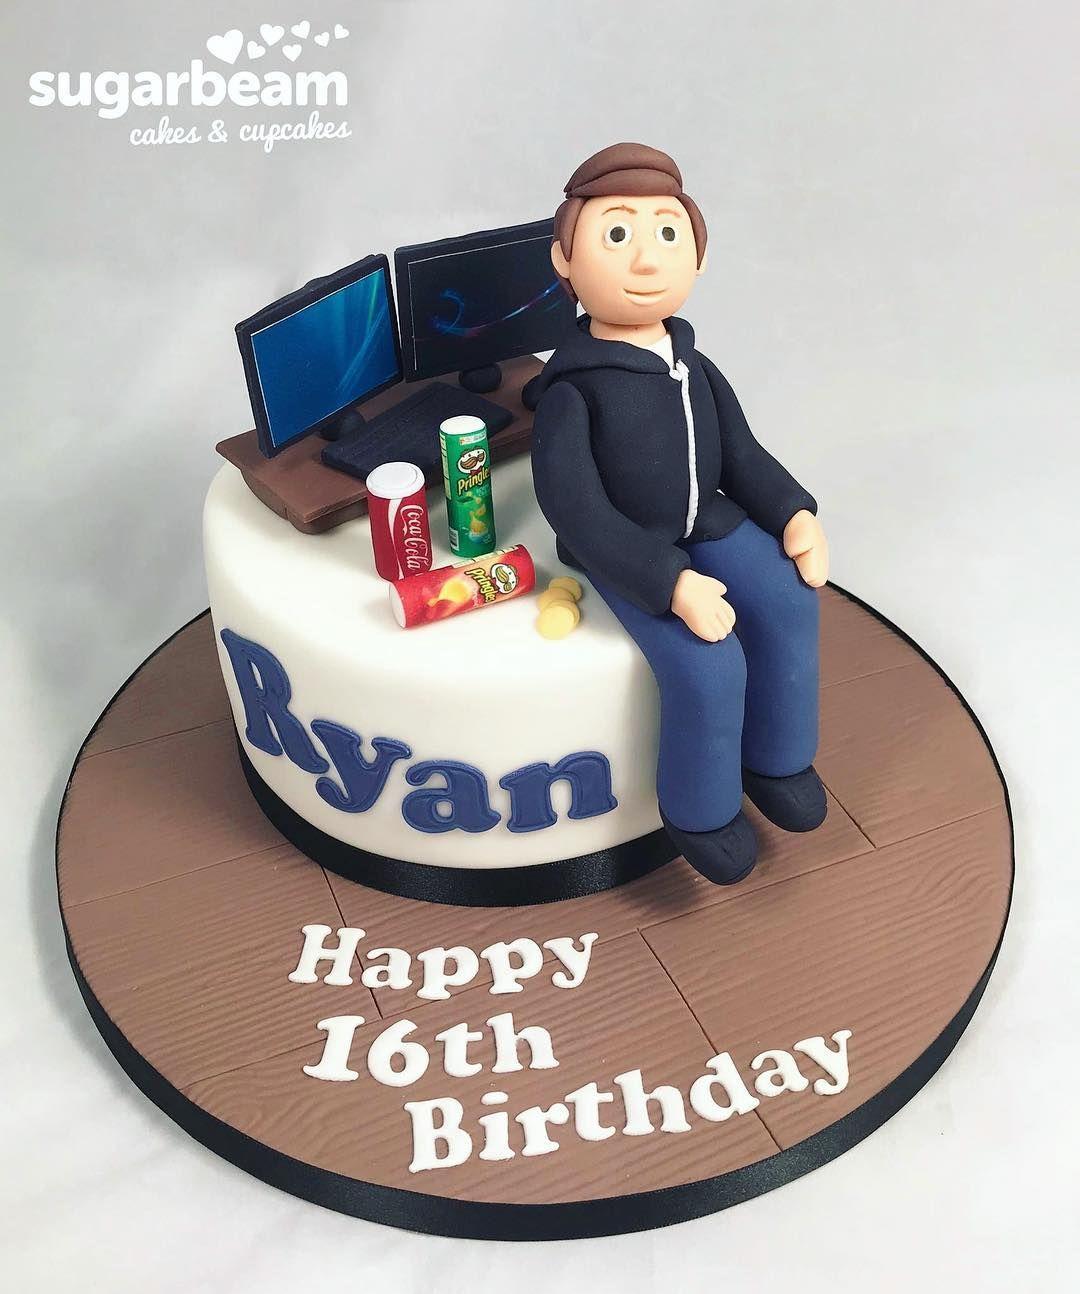 Stupendous 16Th Birthday Cake Boys 16Th Birthday Cake Funny Birthday Cards Online Chimdamsfinfo